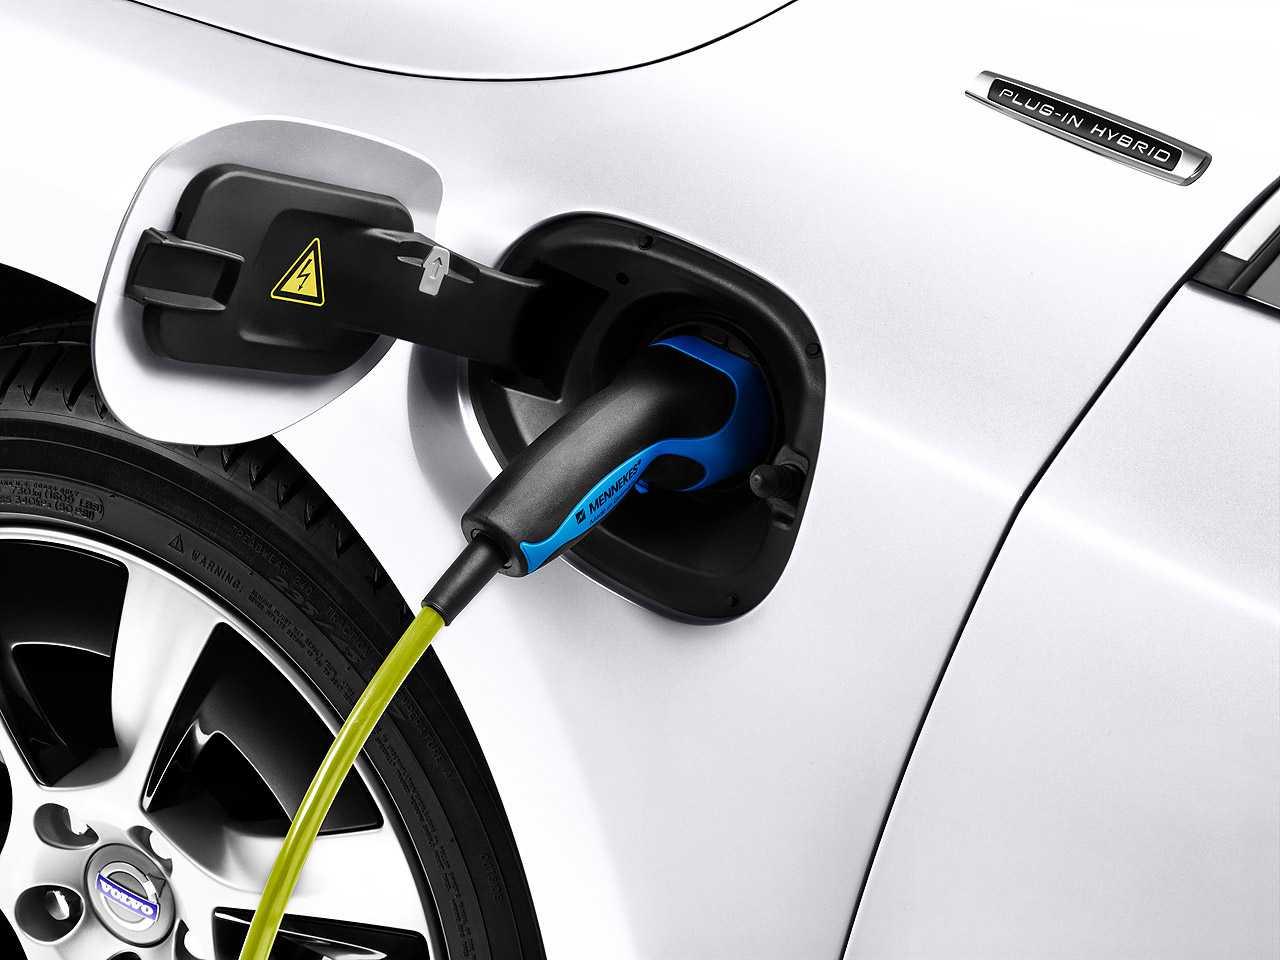 Sistema híbrido plug-in da Volvo